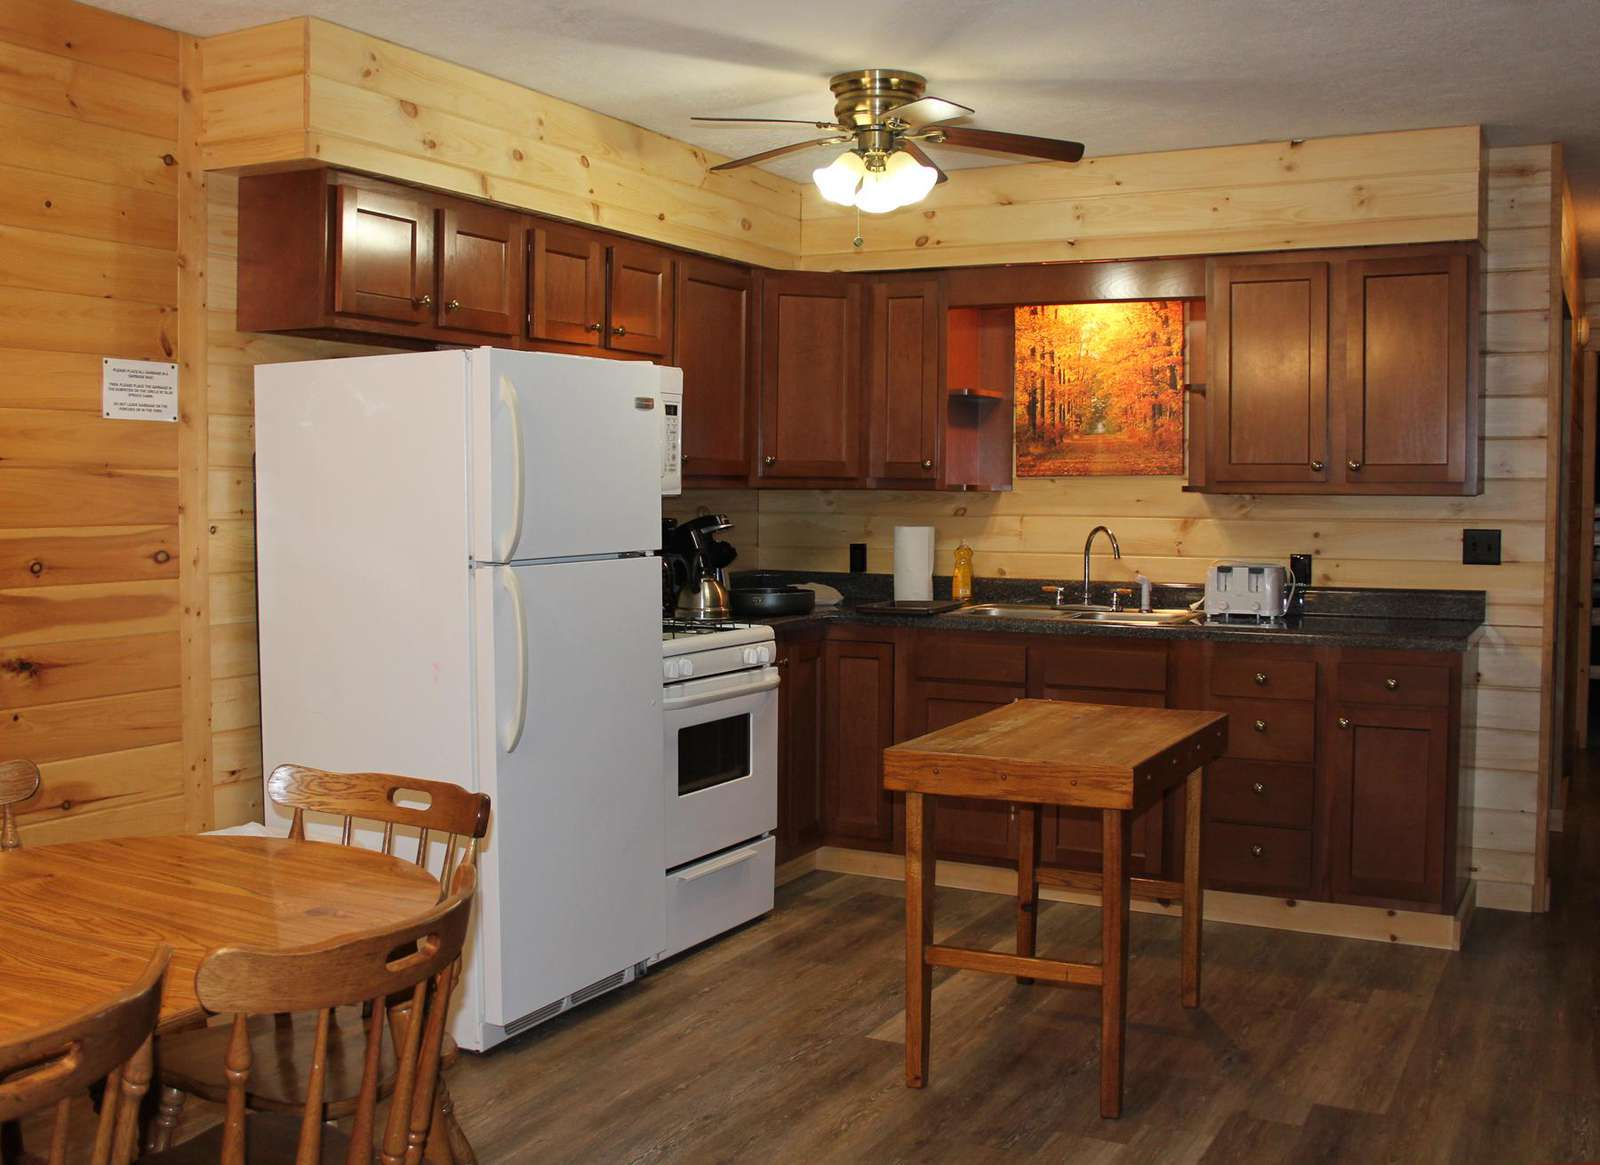 Kitchen - New Kitchen Cupboards and Flooring